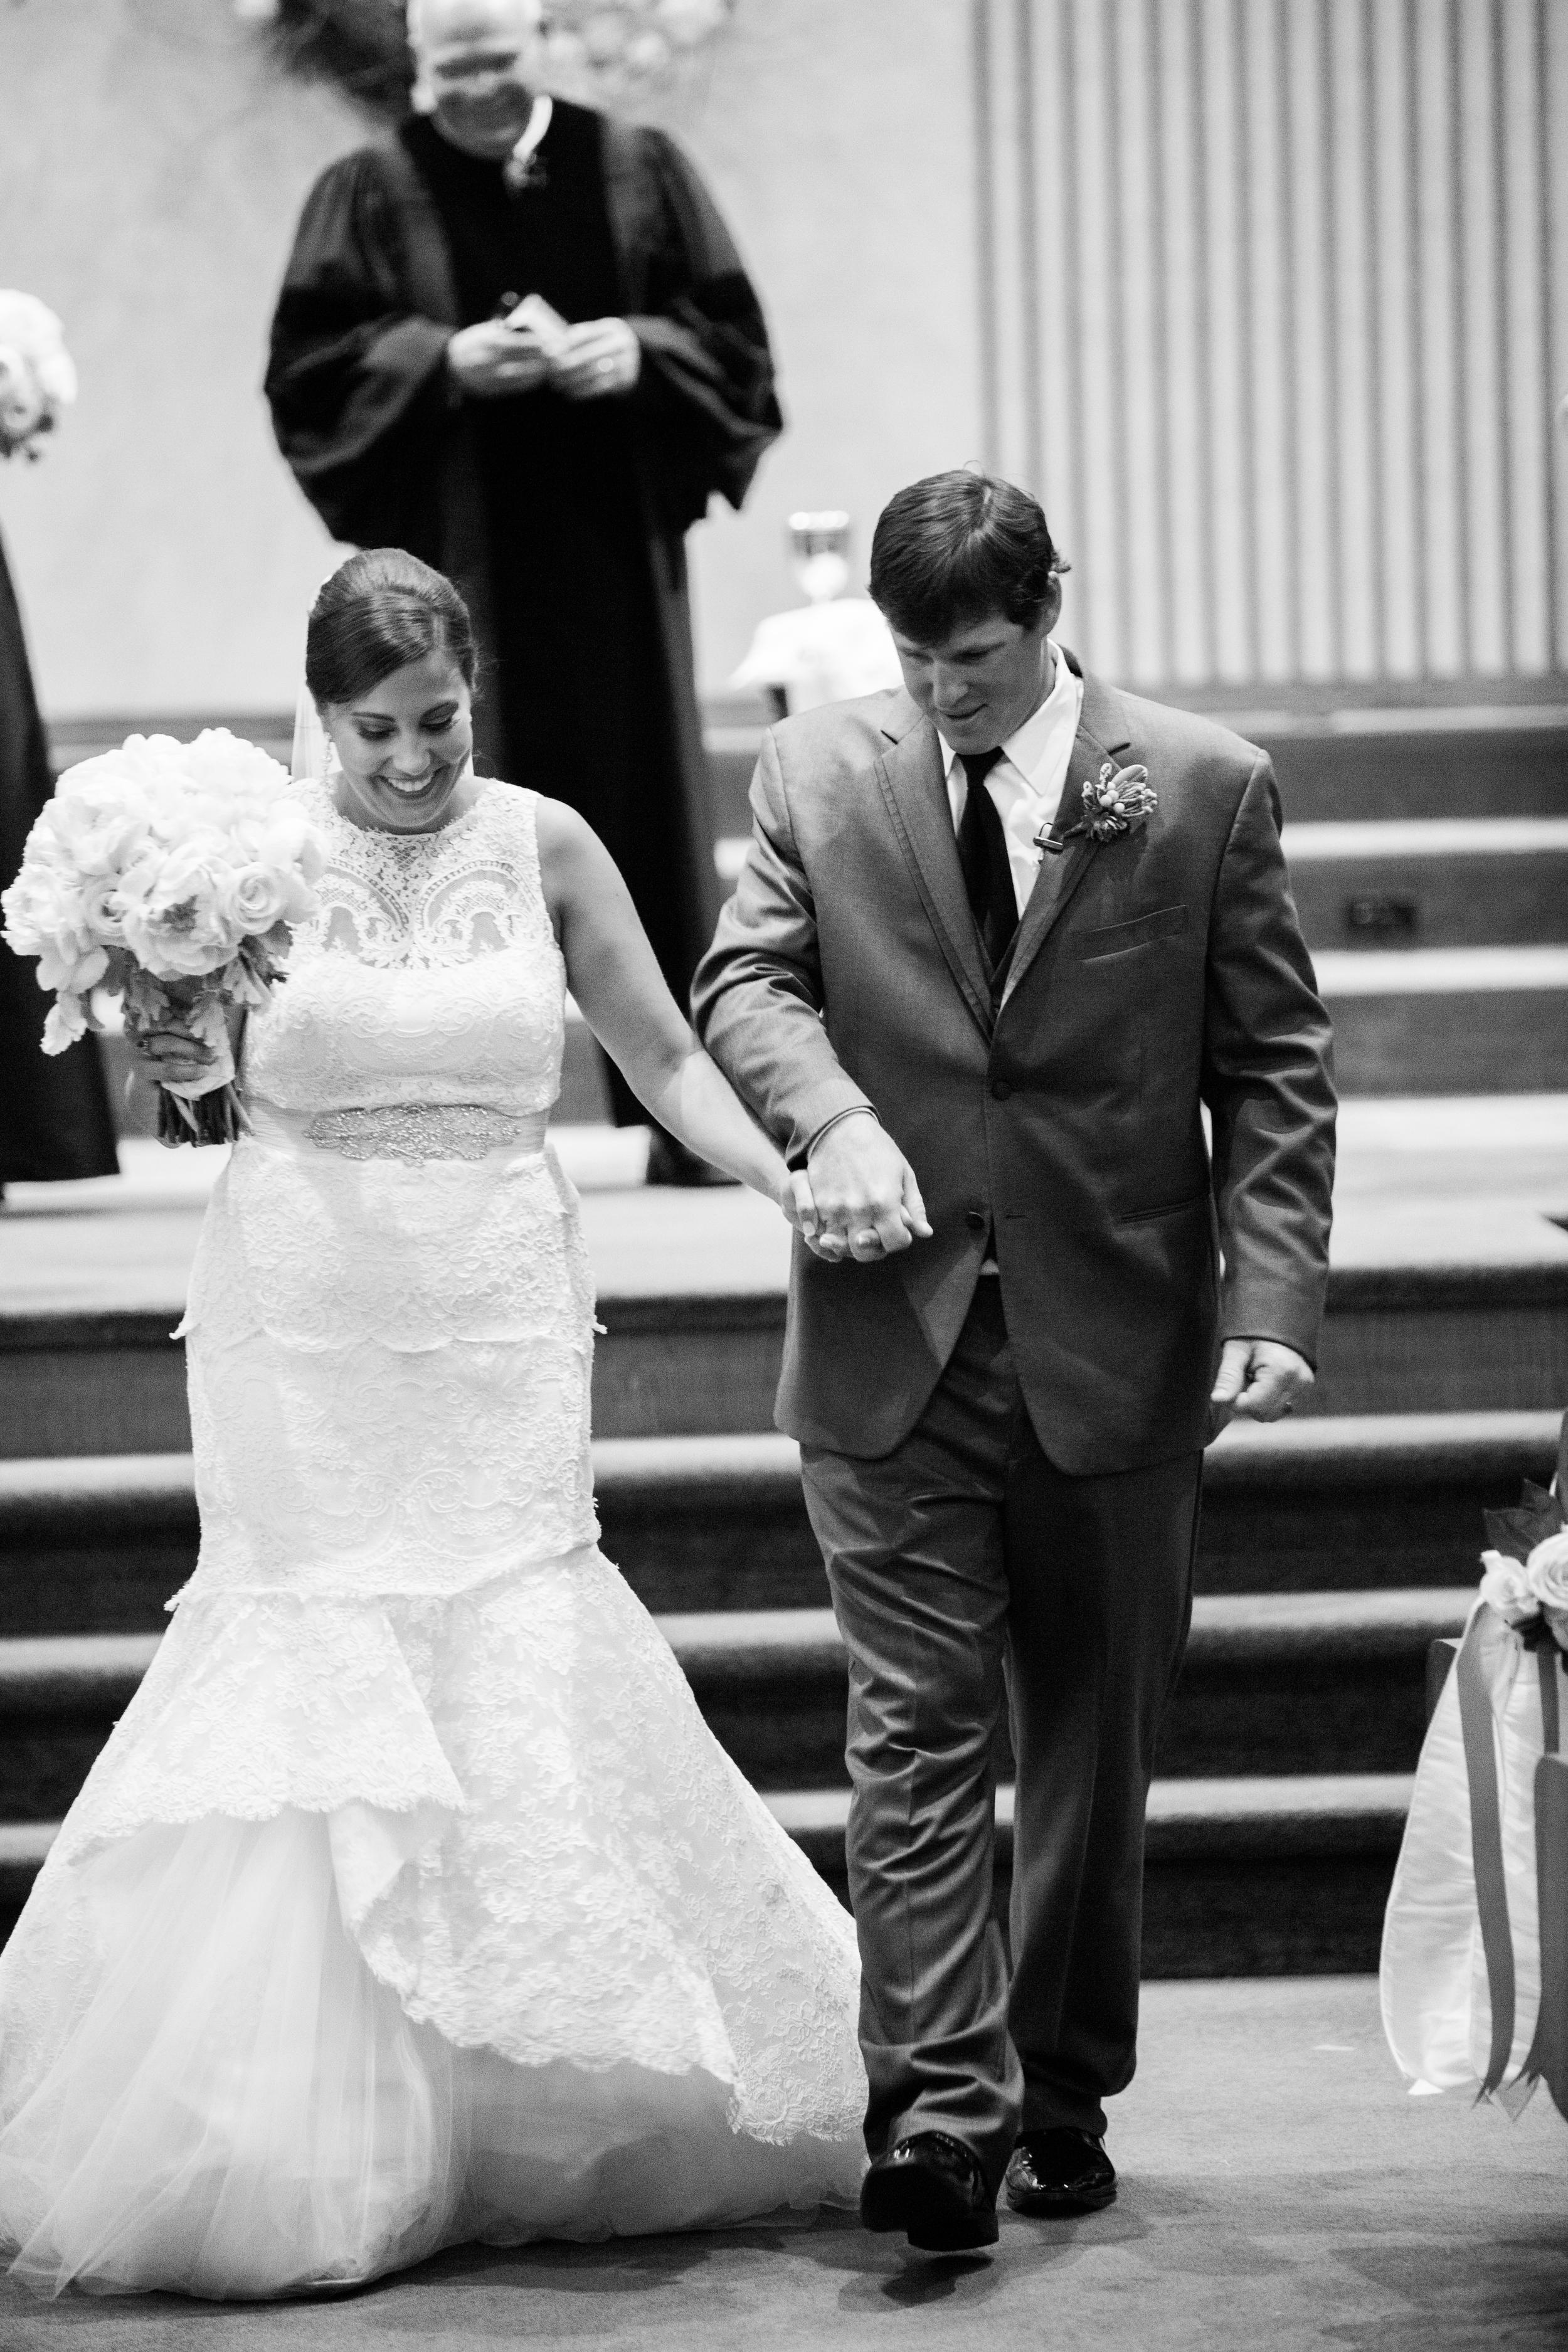 Alabama-Wedding-Photographers-Nick-Elizabeth-Drollette-127.jpg